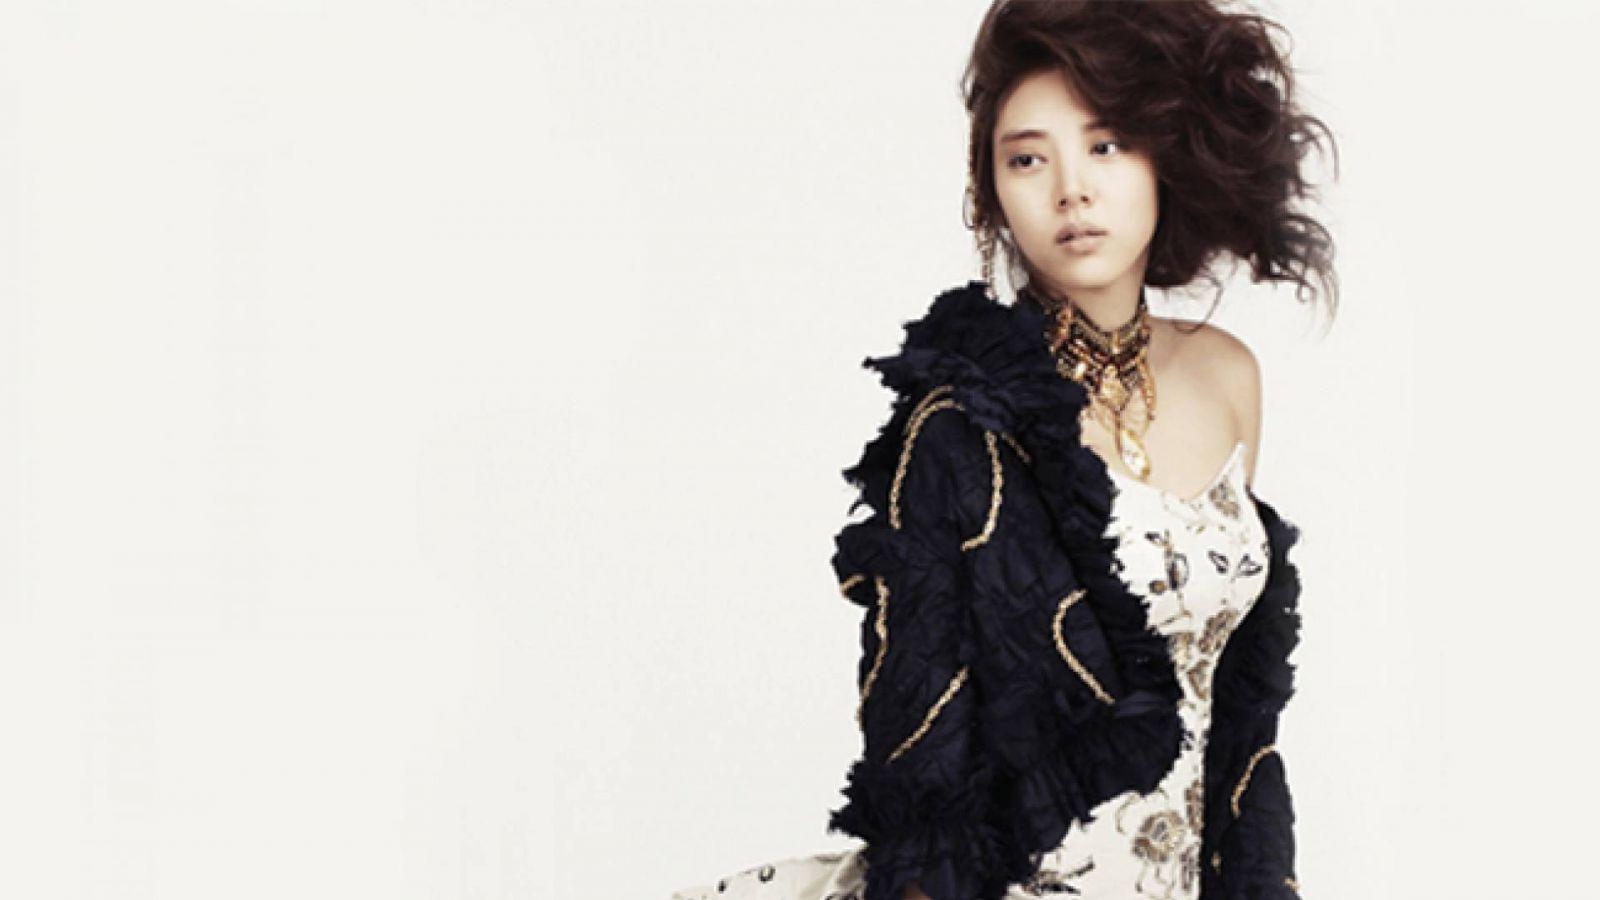 Son Dambi adia seu comeback © Pledis Entertainment